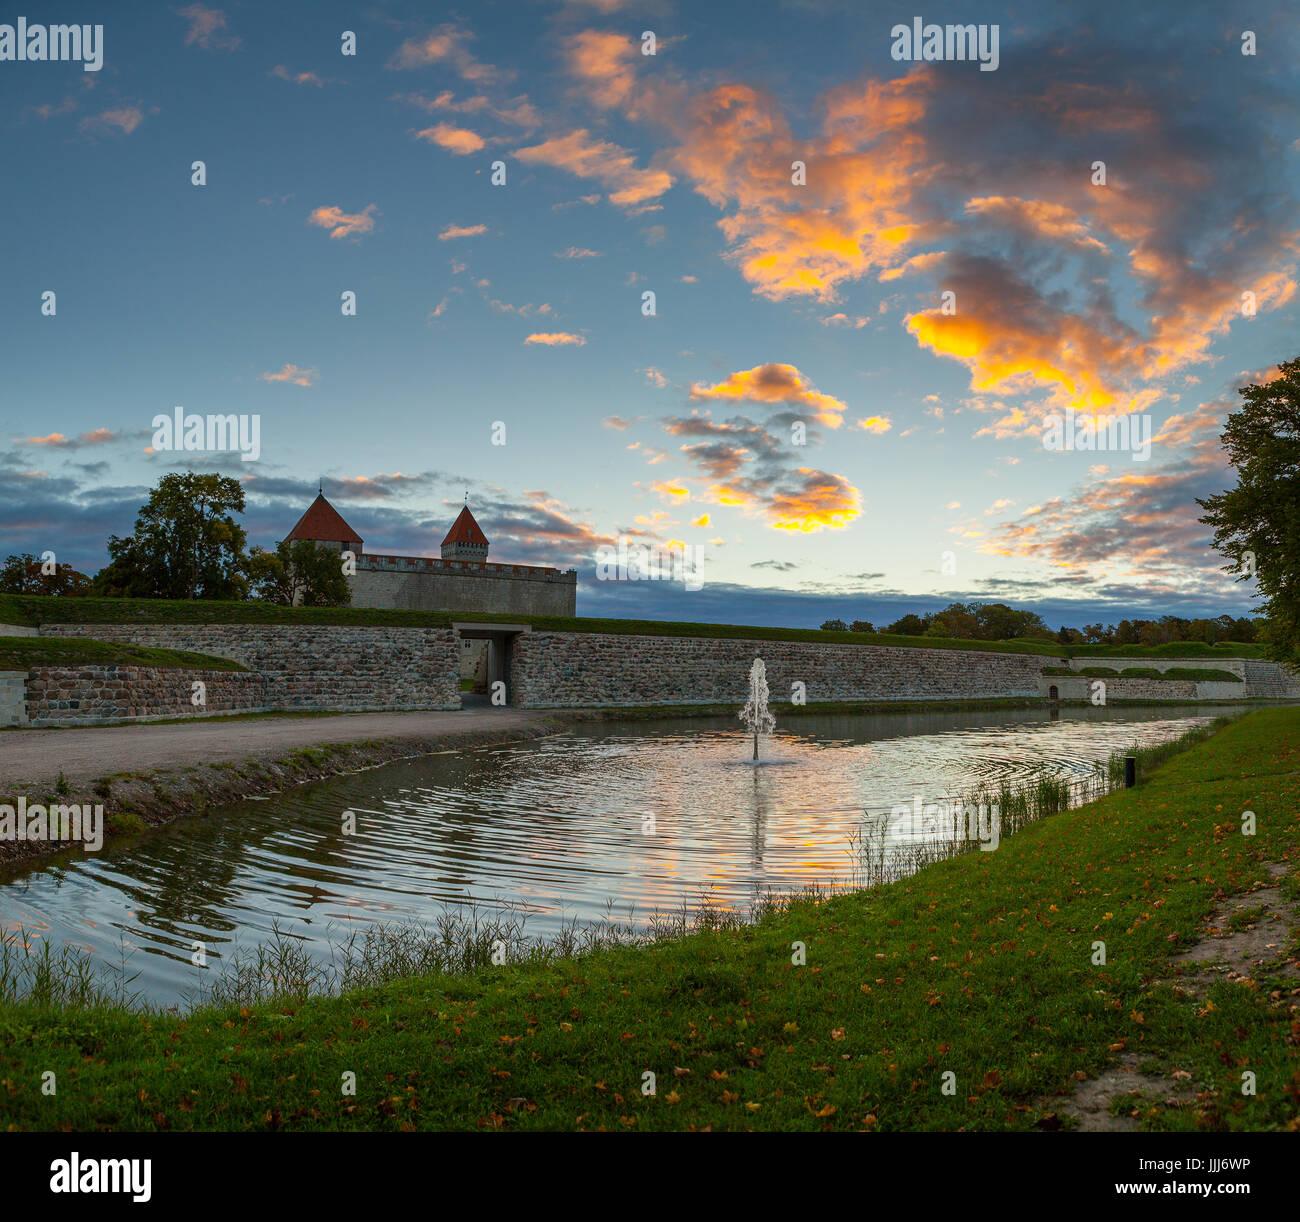 Colorful sunrise over Kuressaare castle, summer time. Saaremaa island, Estonia Stock Photo